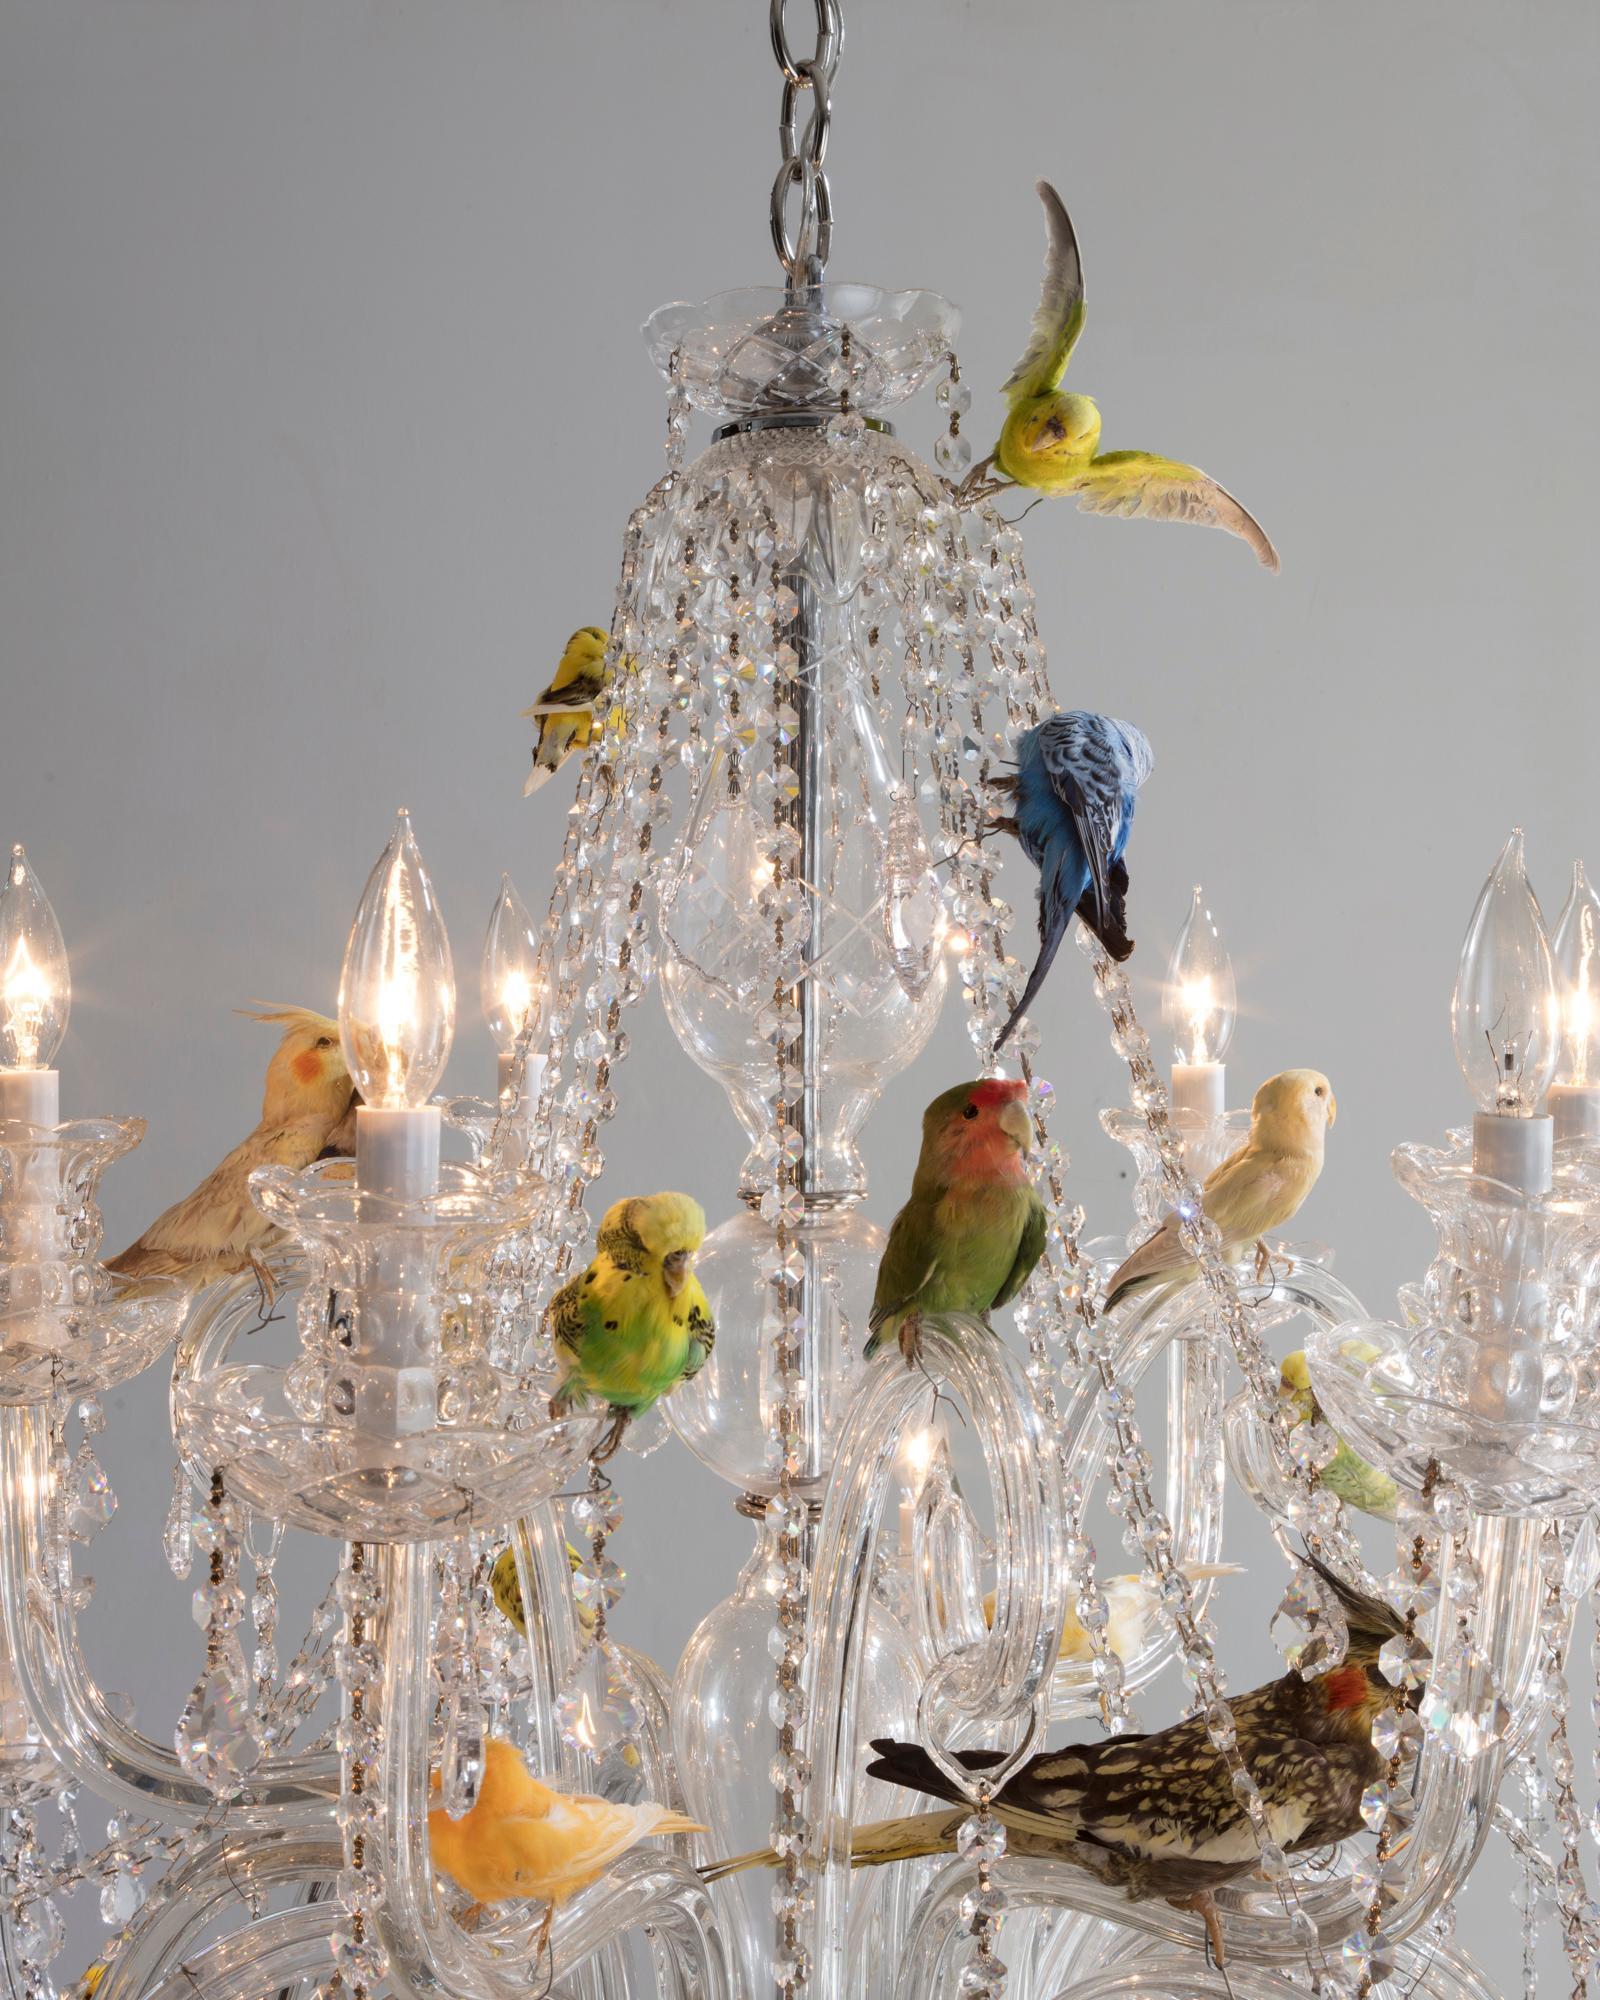 Bird Chandelier Crystal With Taxidermy Birds By